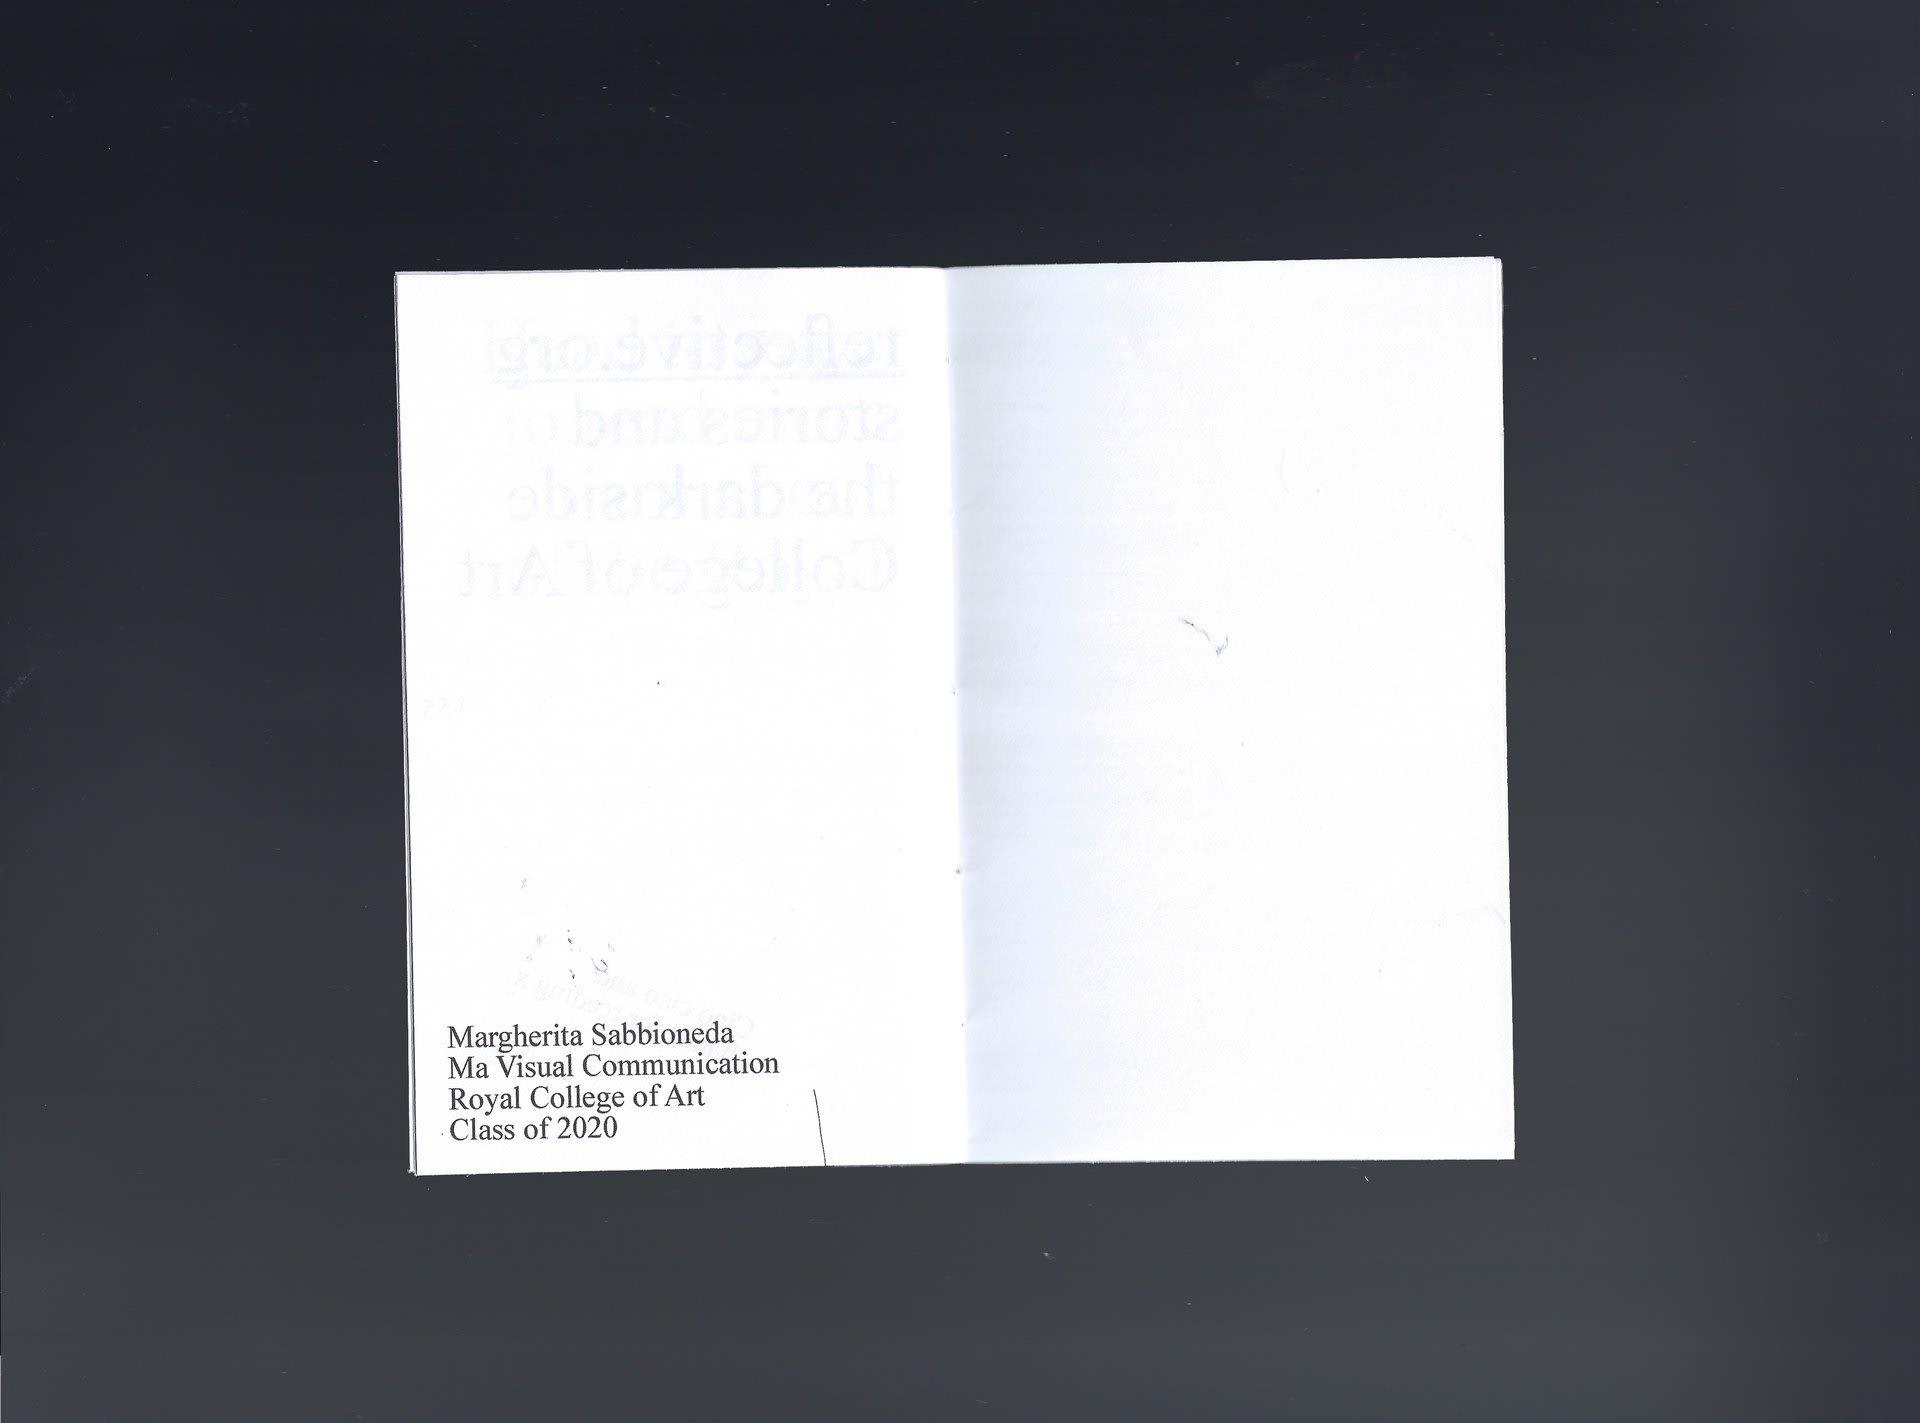 pp.56–57